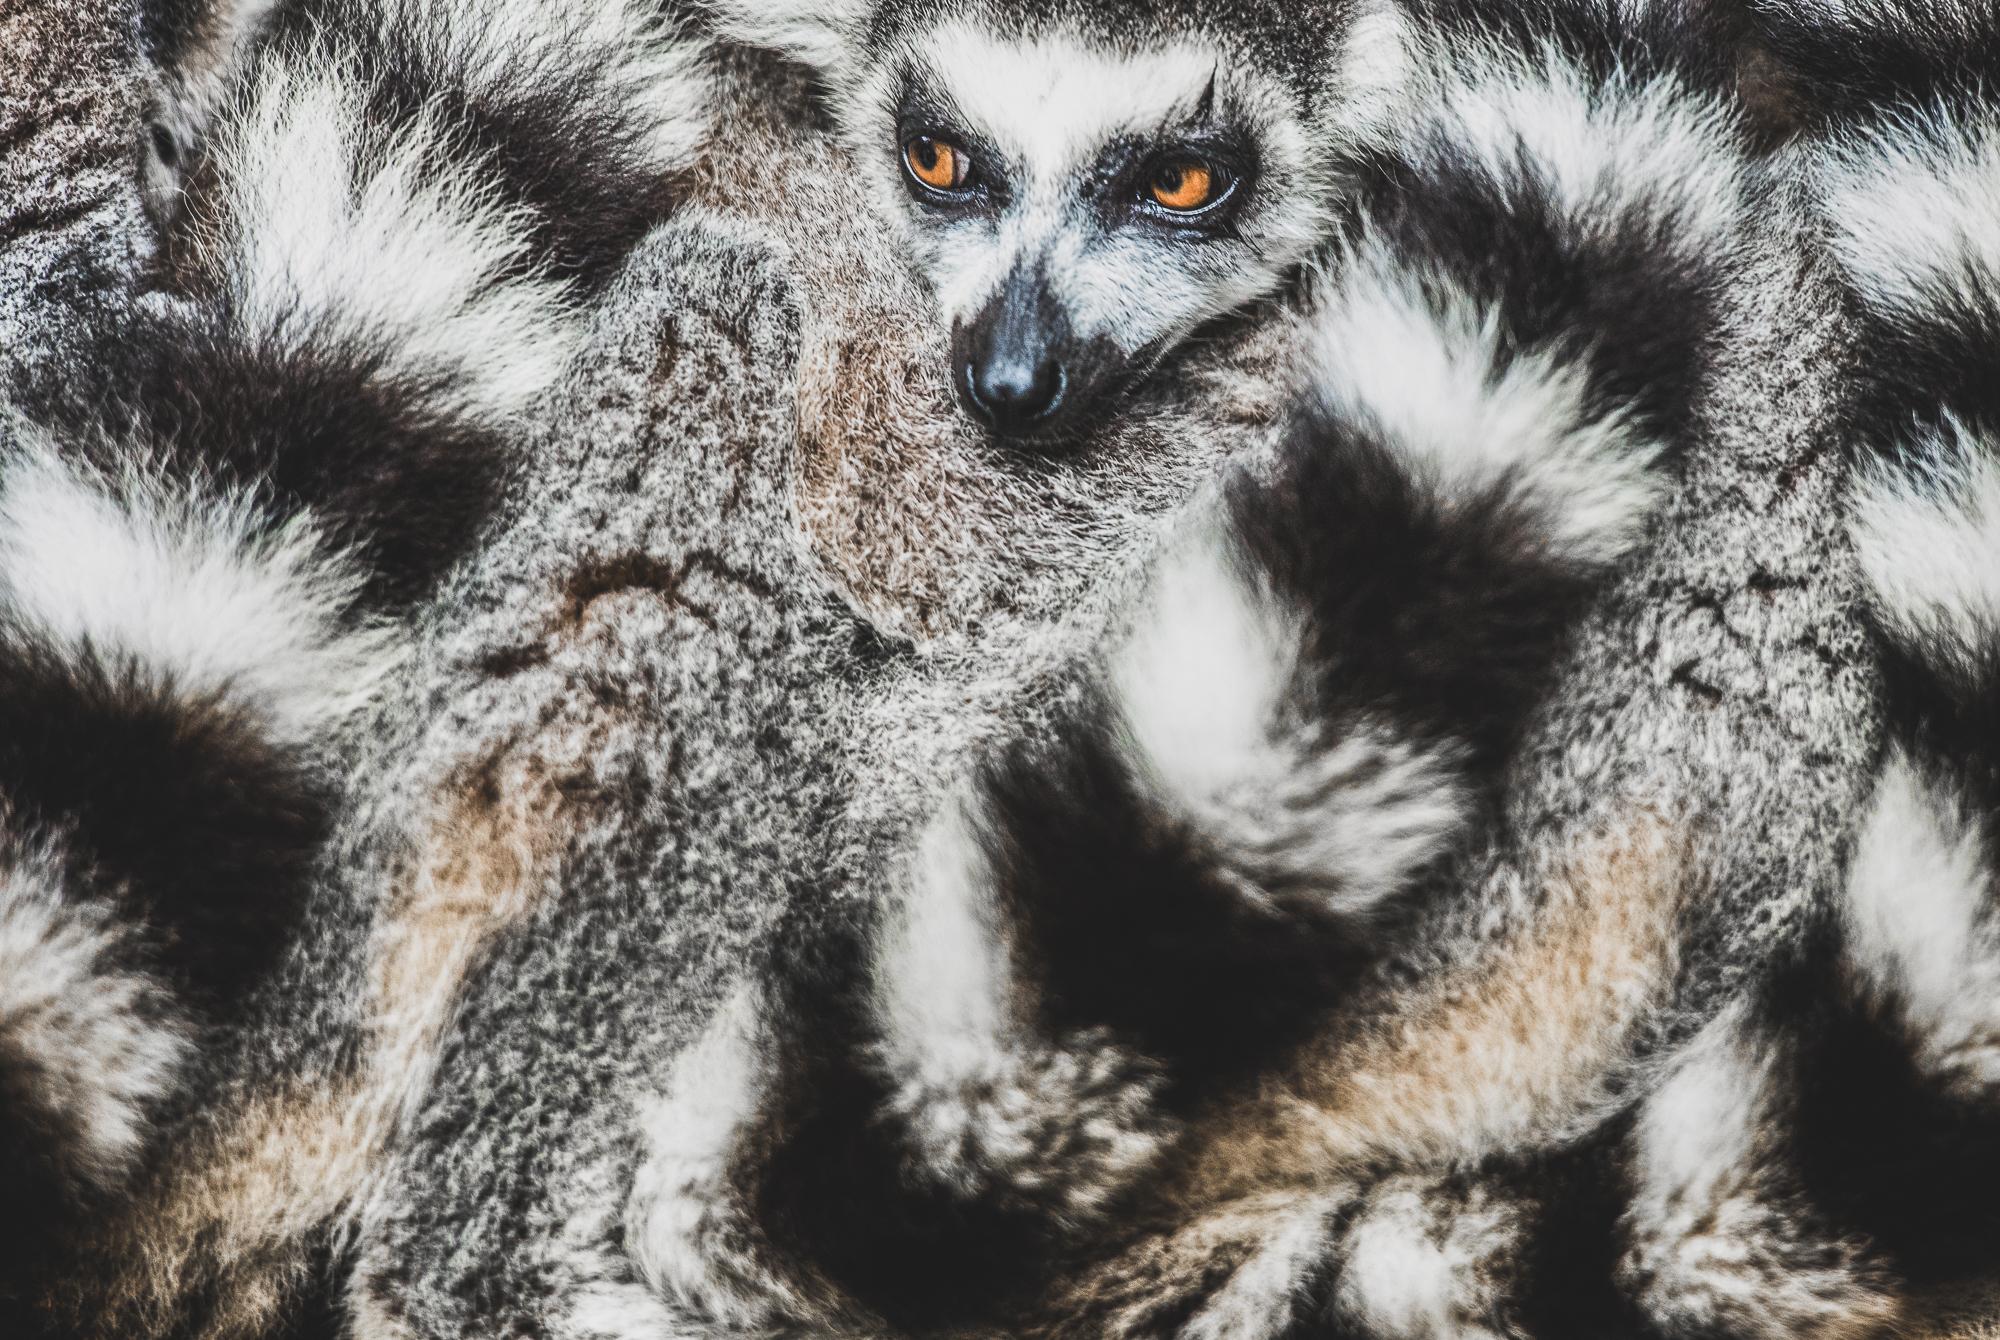 Lemurs Wrapped together